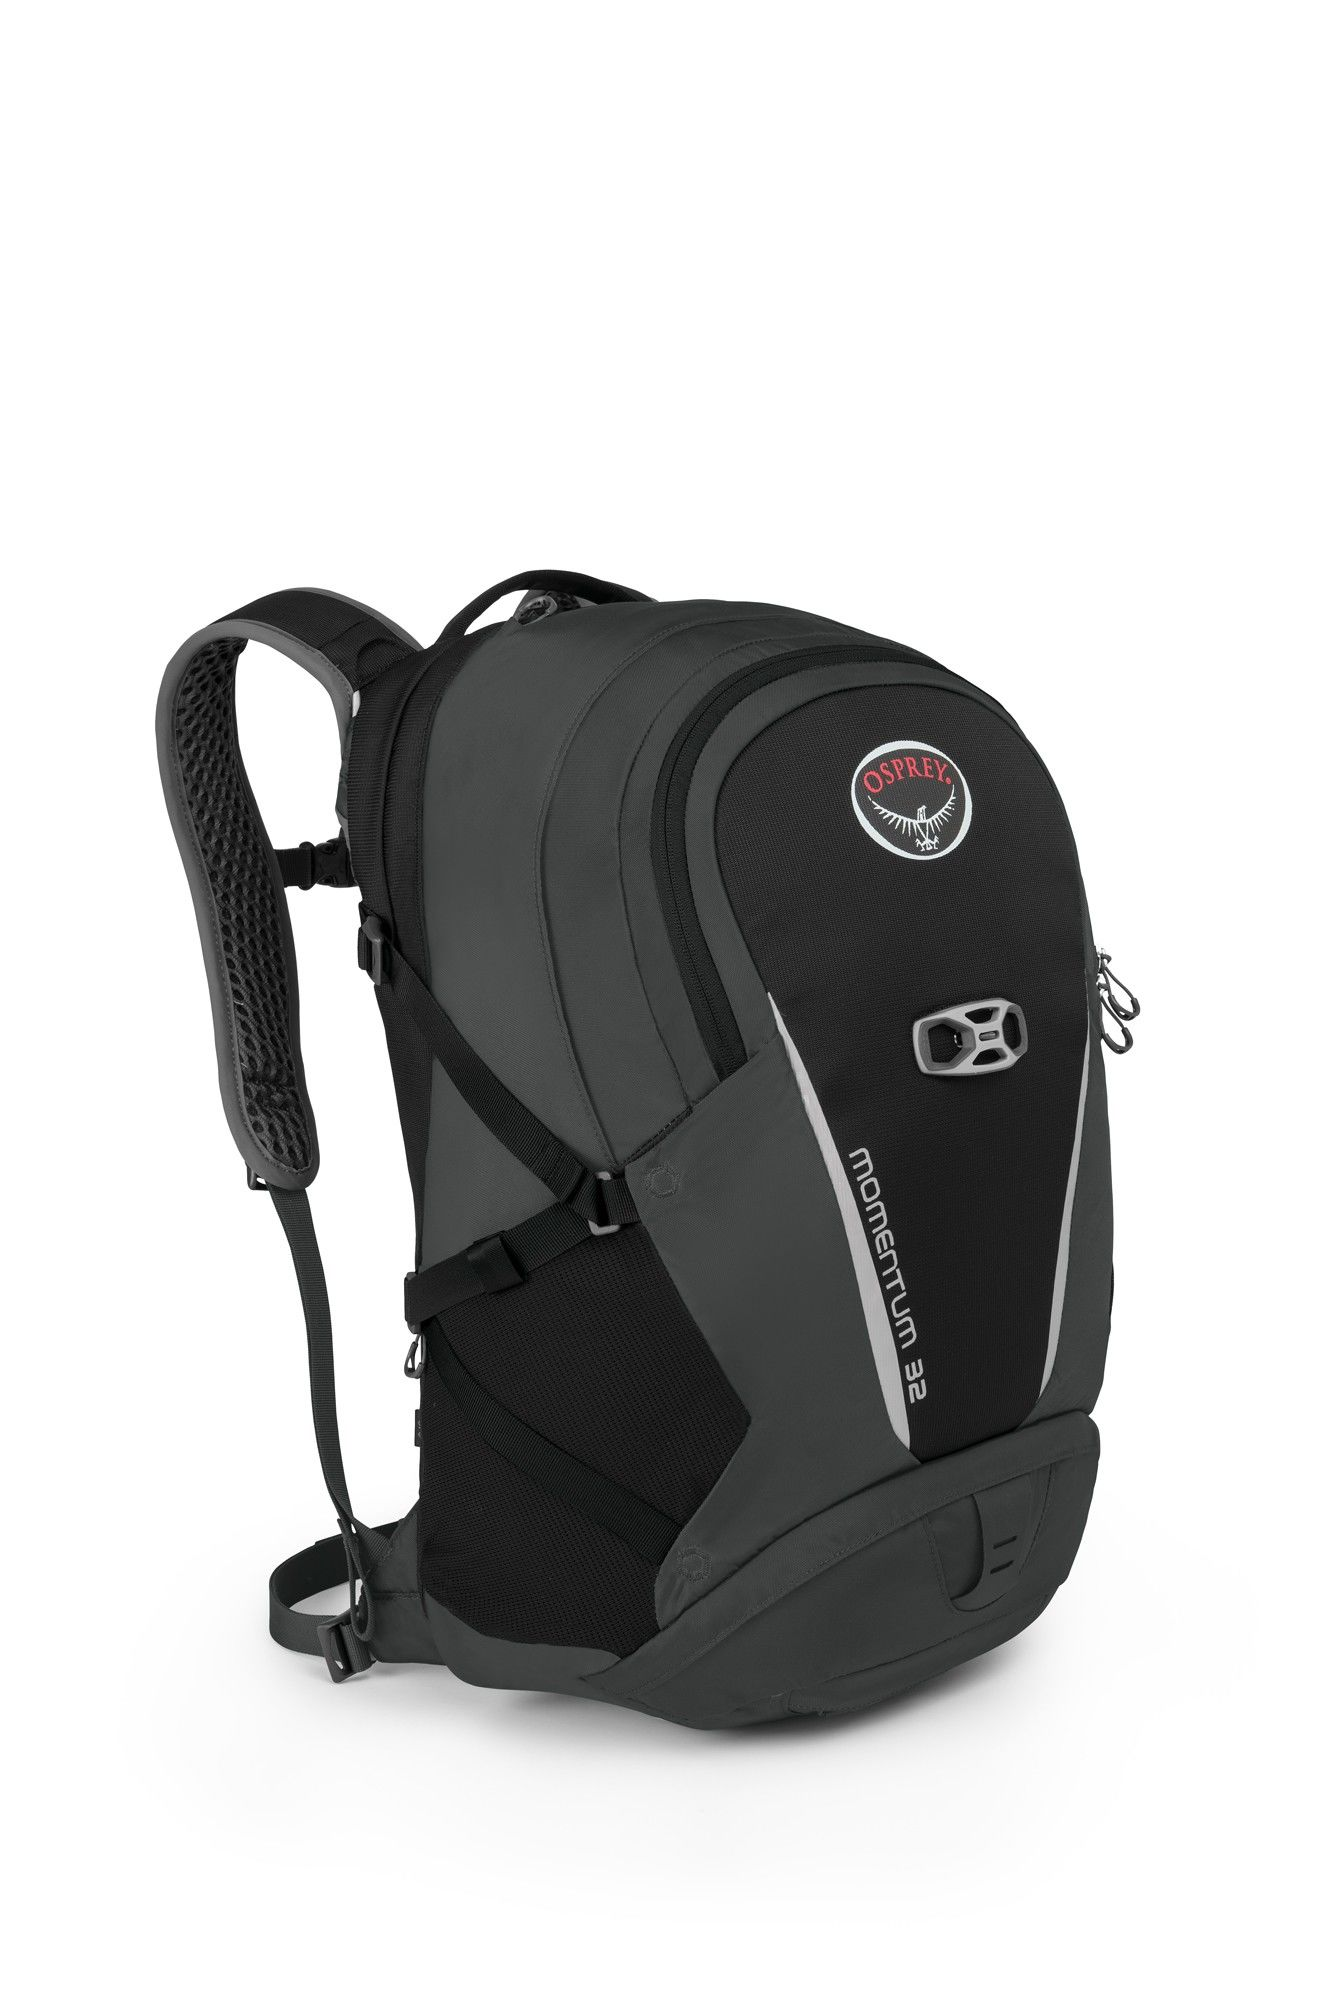 Osprey Momentum 32 | Größe 32l |  Büro- & Schulrucksack